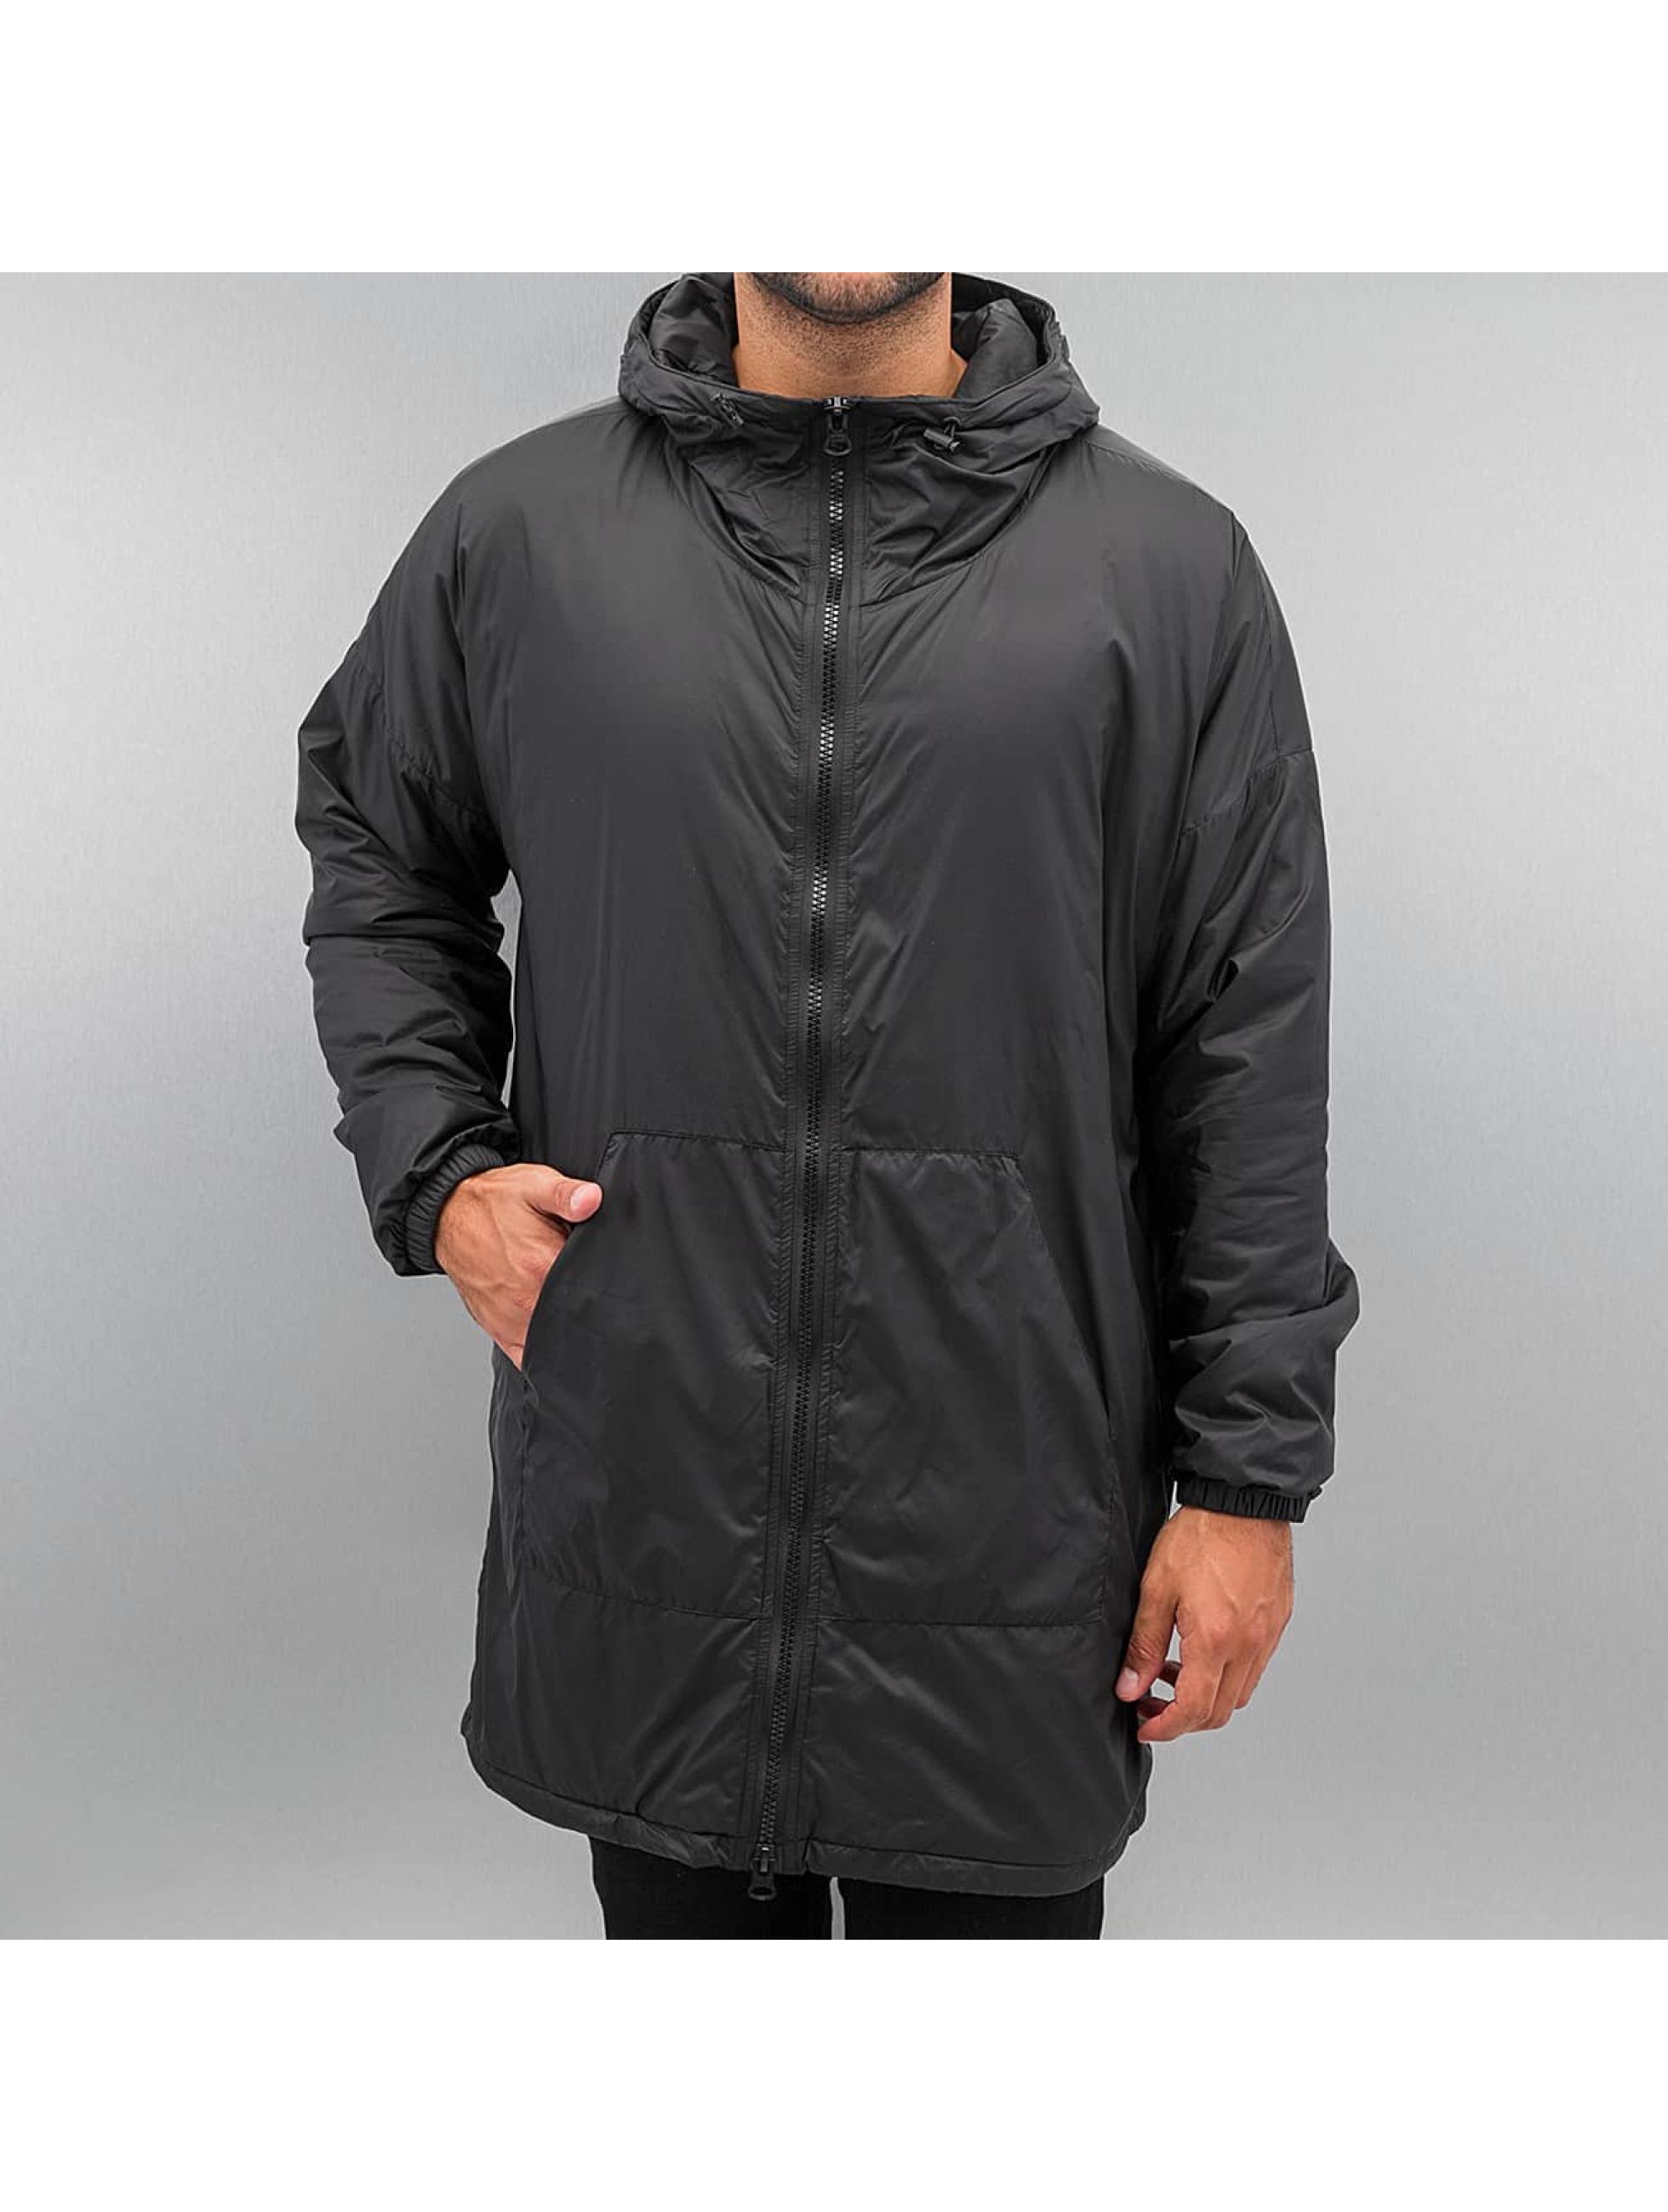 Urban Classics Transitional Jackets Oversized svart